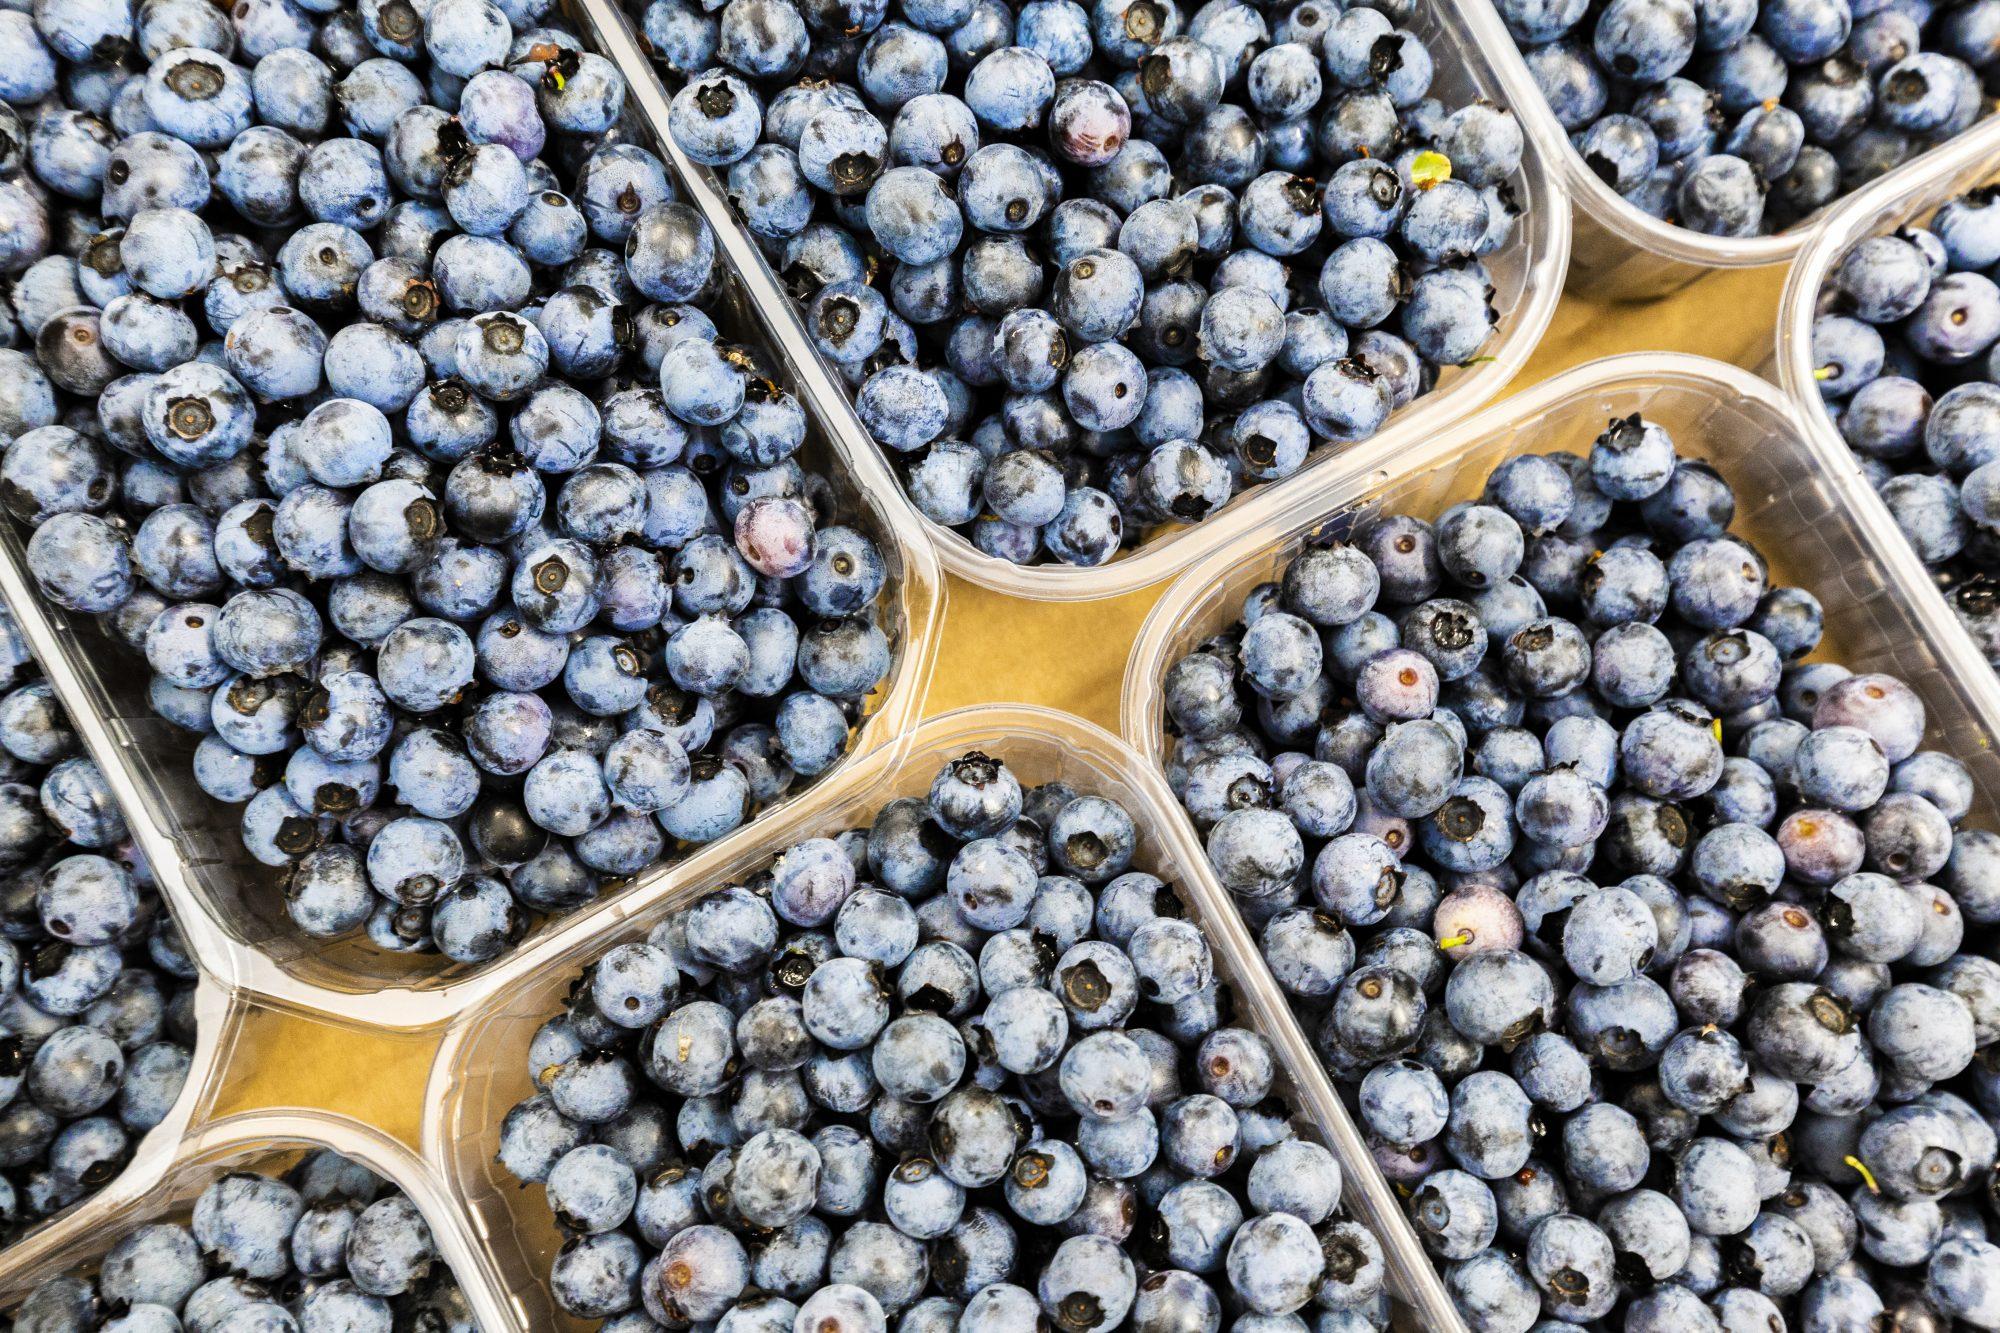 Blueberries in baskets Getty 7/16/20